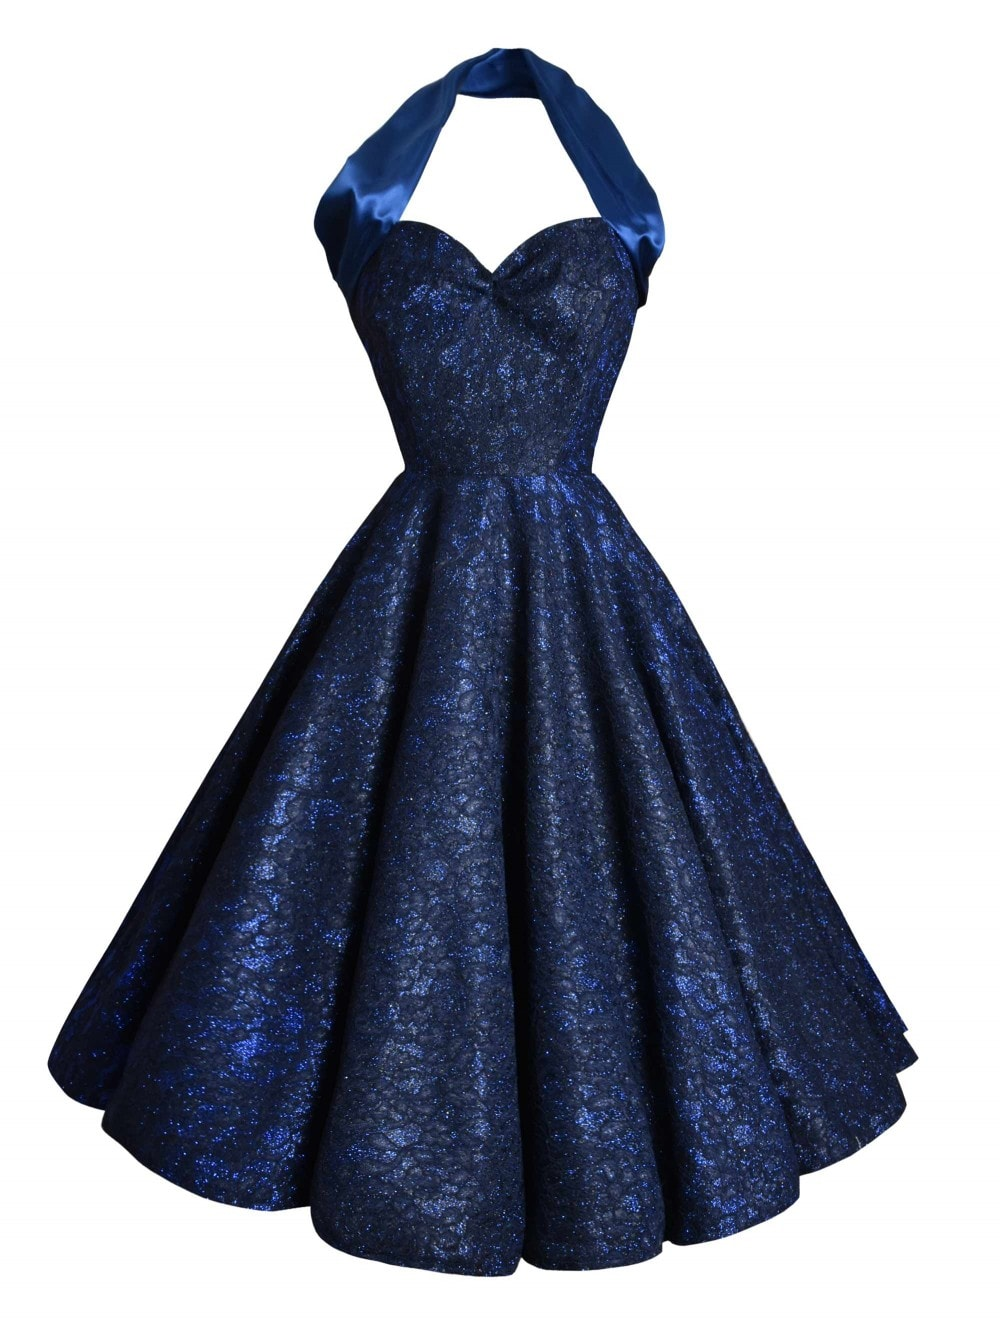 1950s Halterneck Sapphire Sparkle Dress From Vivien Of